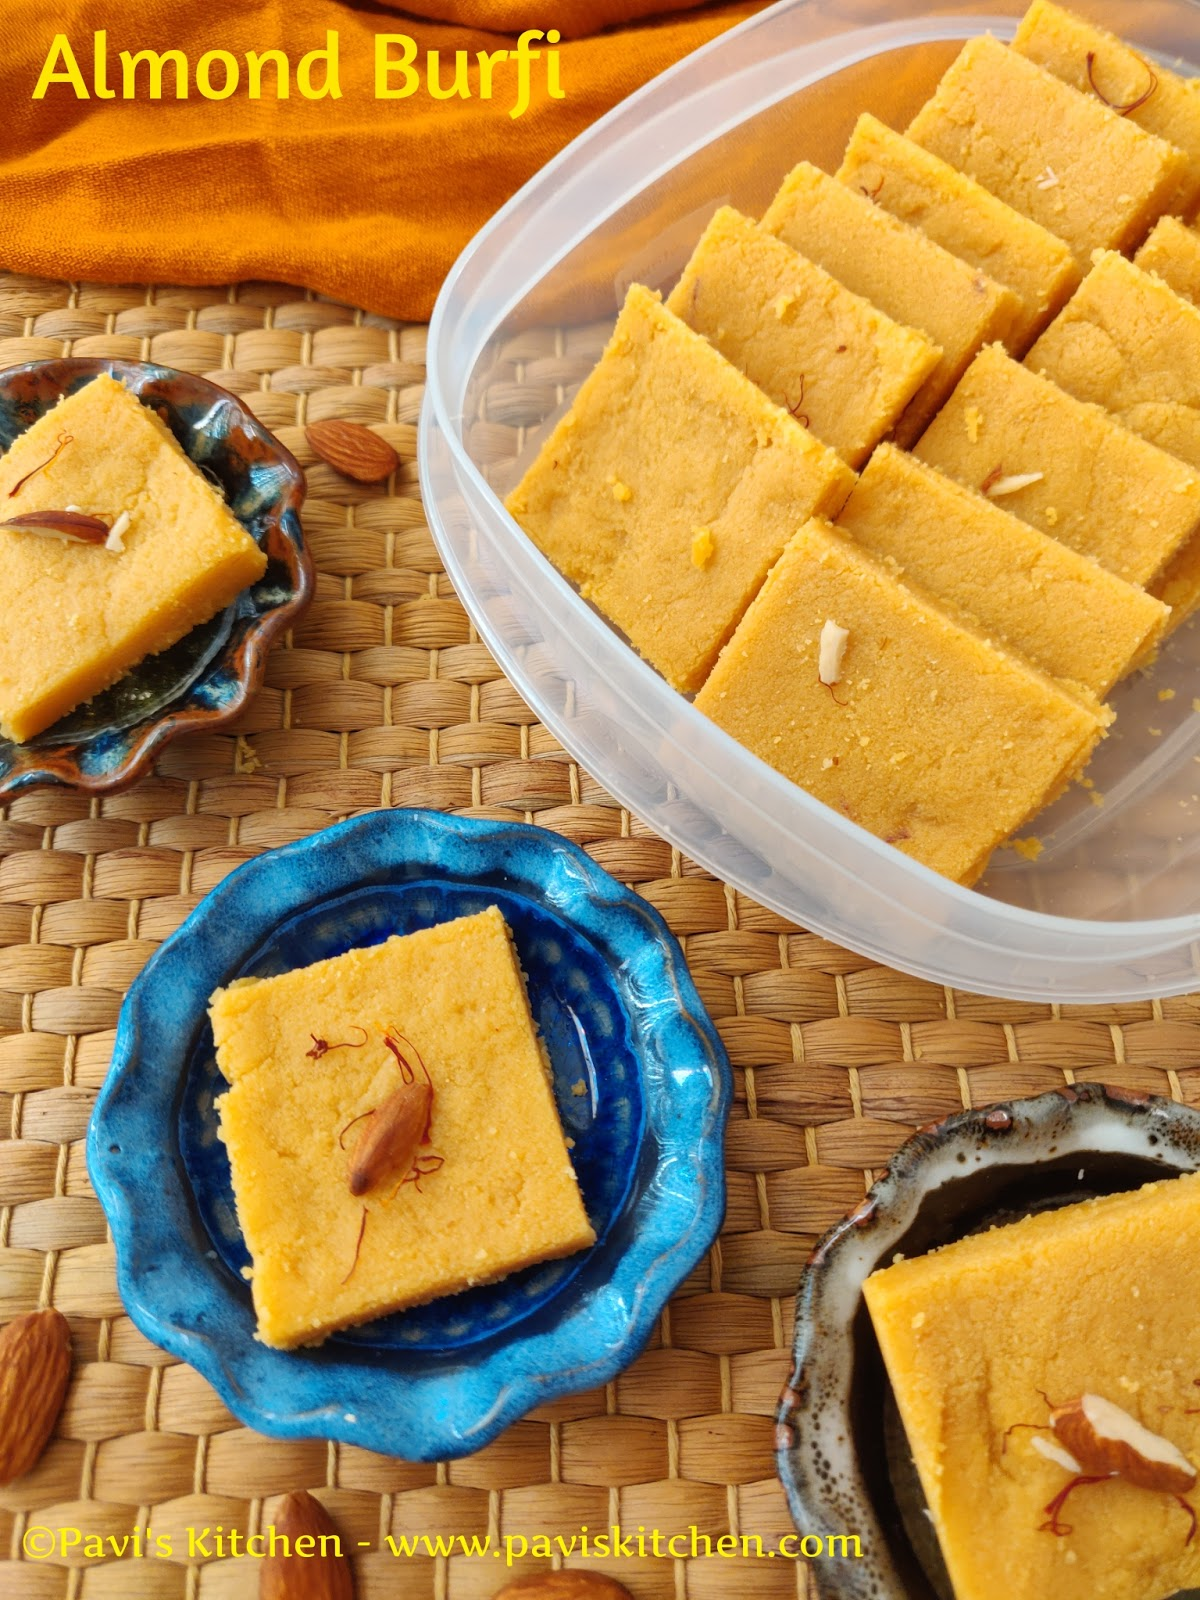 Almond Burfi Recipe | Kesar Badam Burfi Recipe | Almond with Saffron Burfi Recipe